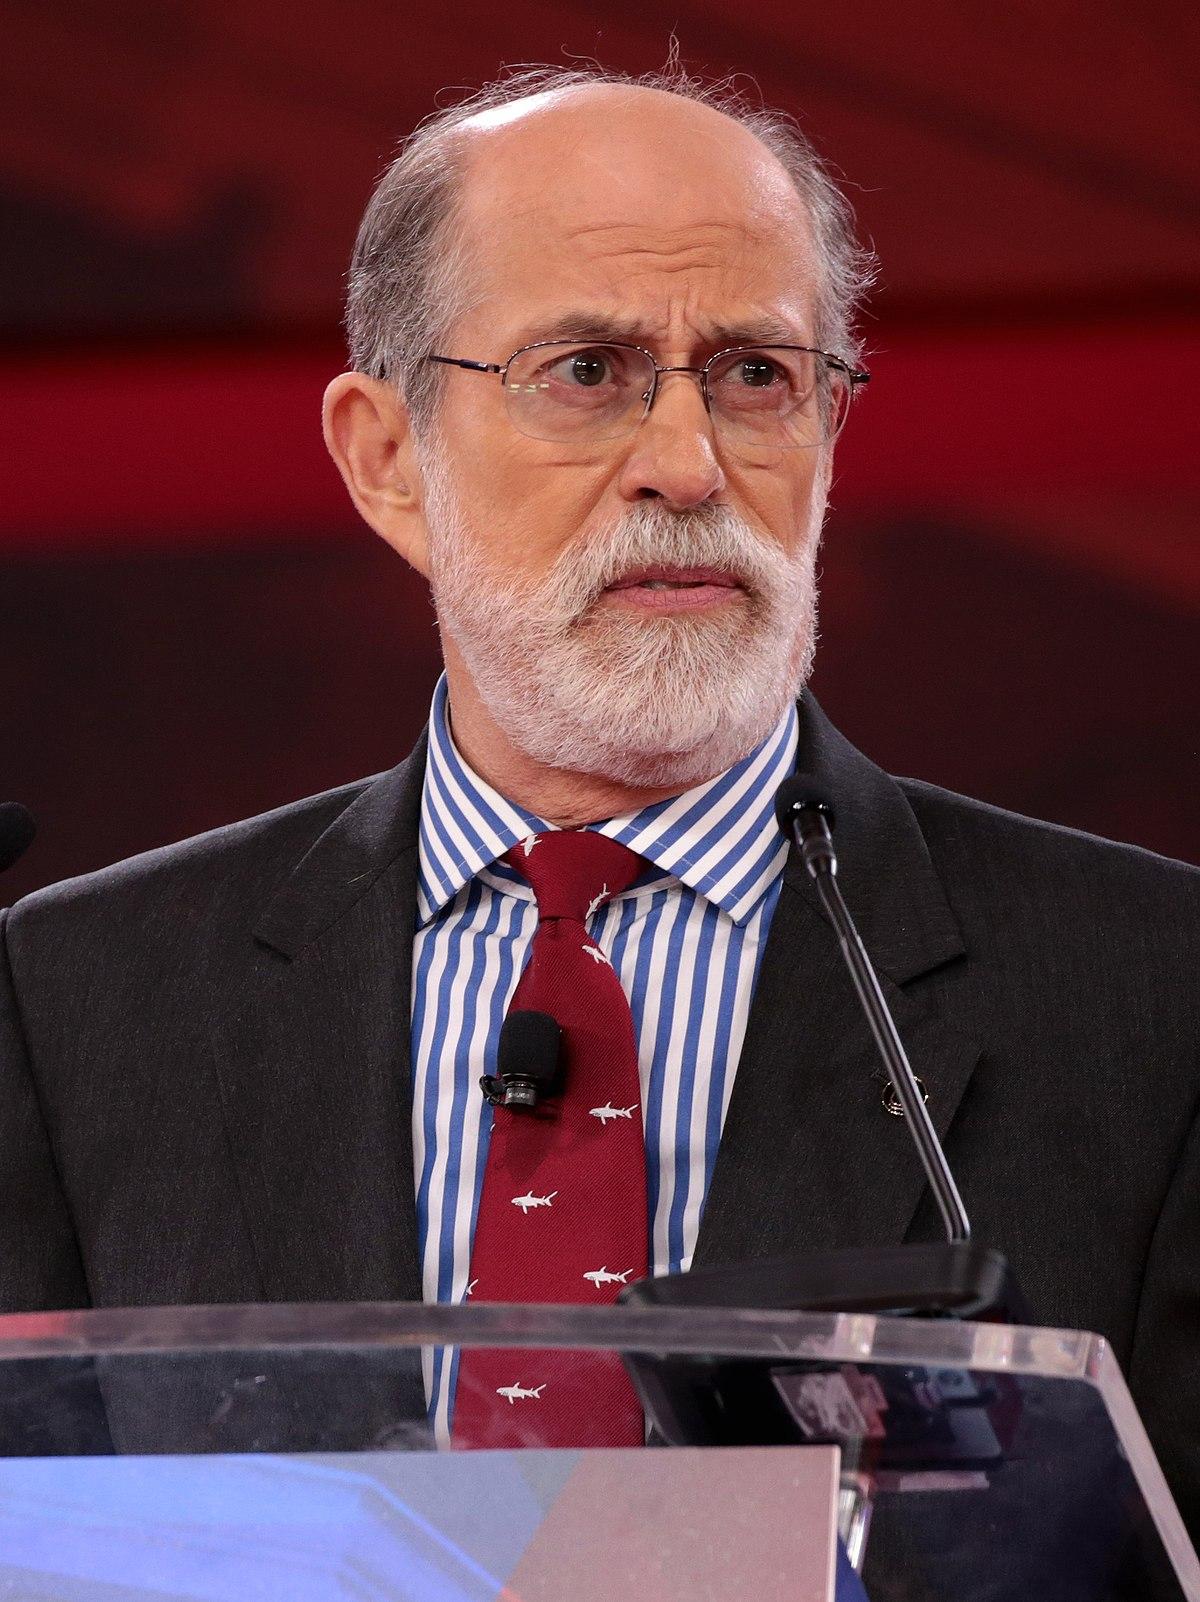 Frank Gaffney Wikipedia